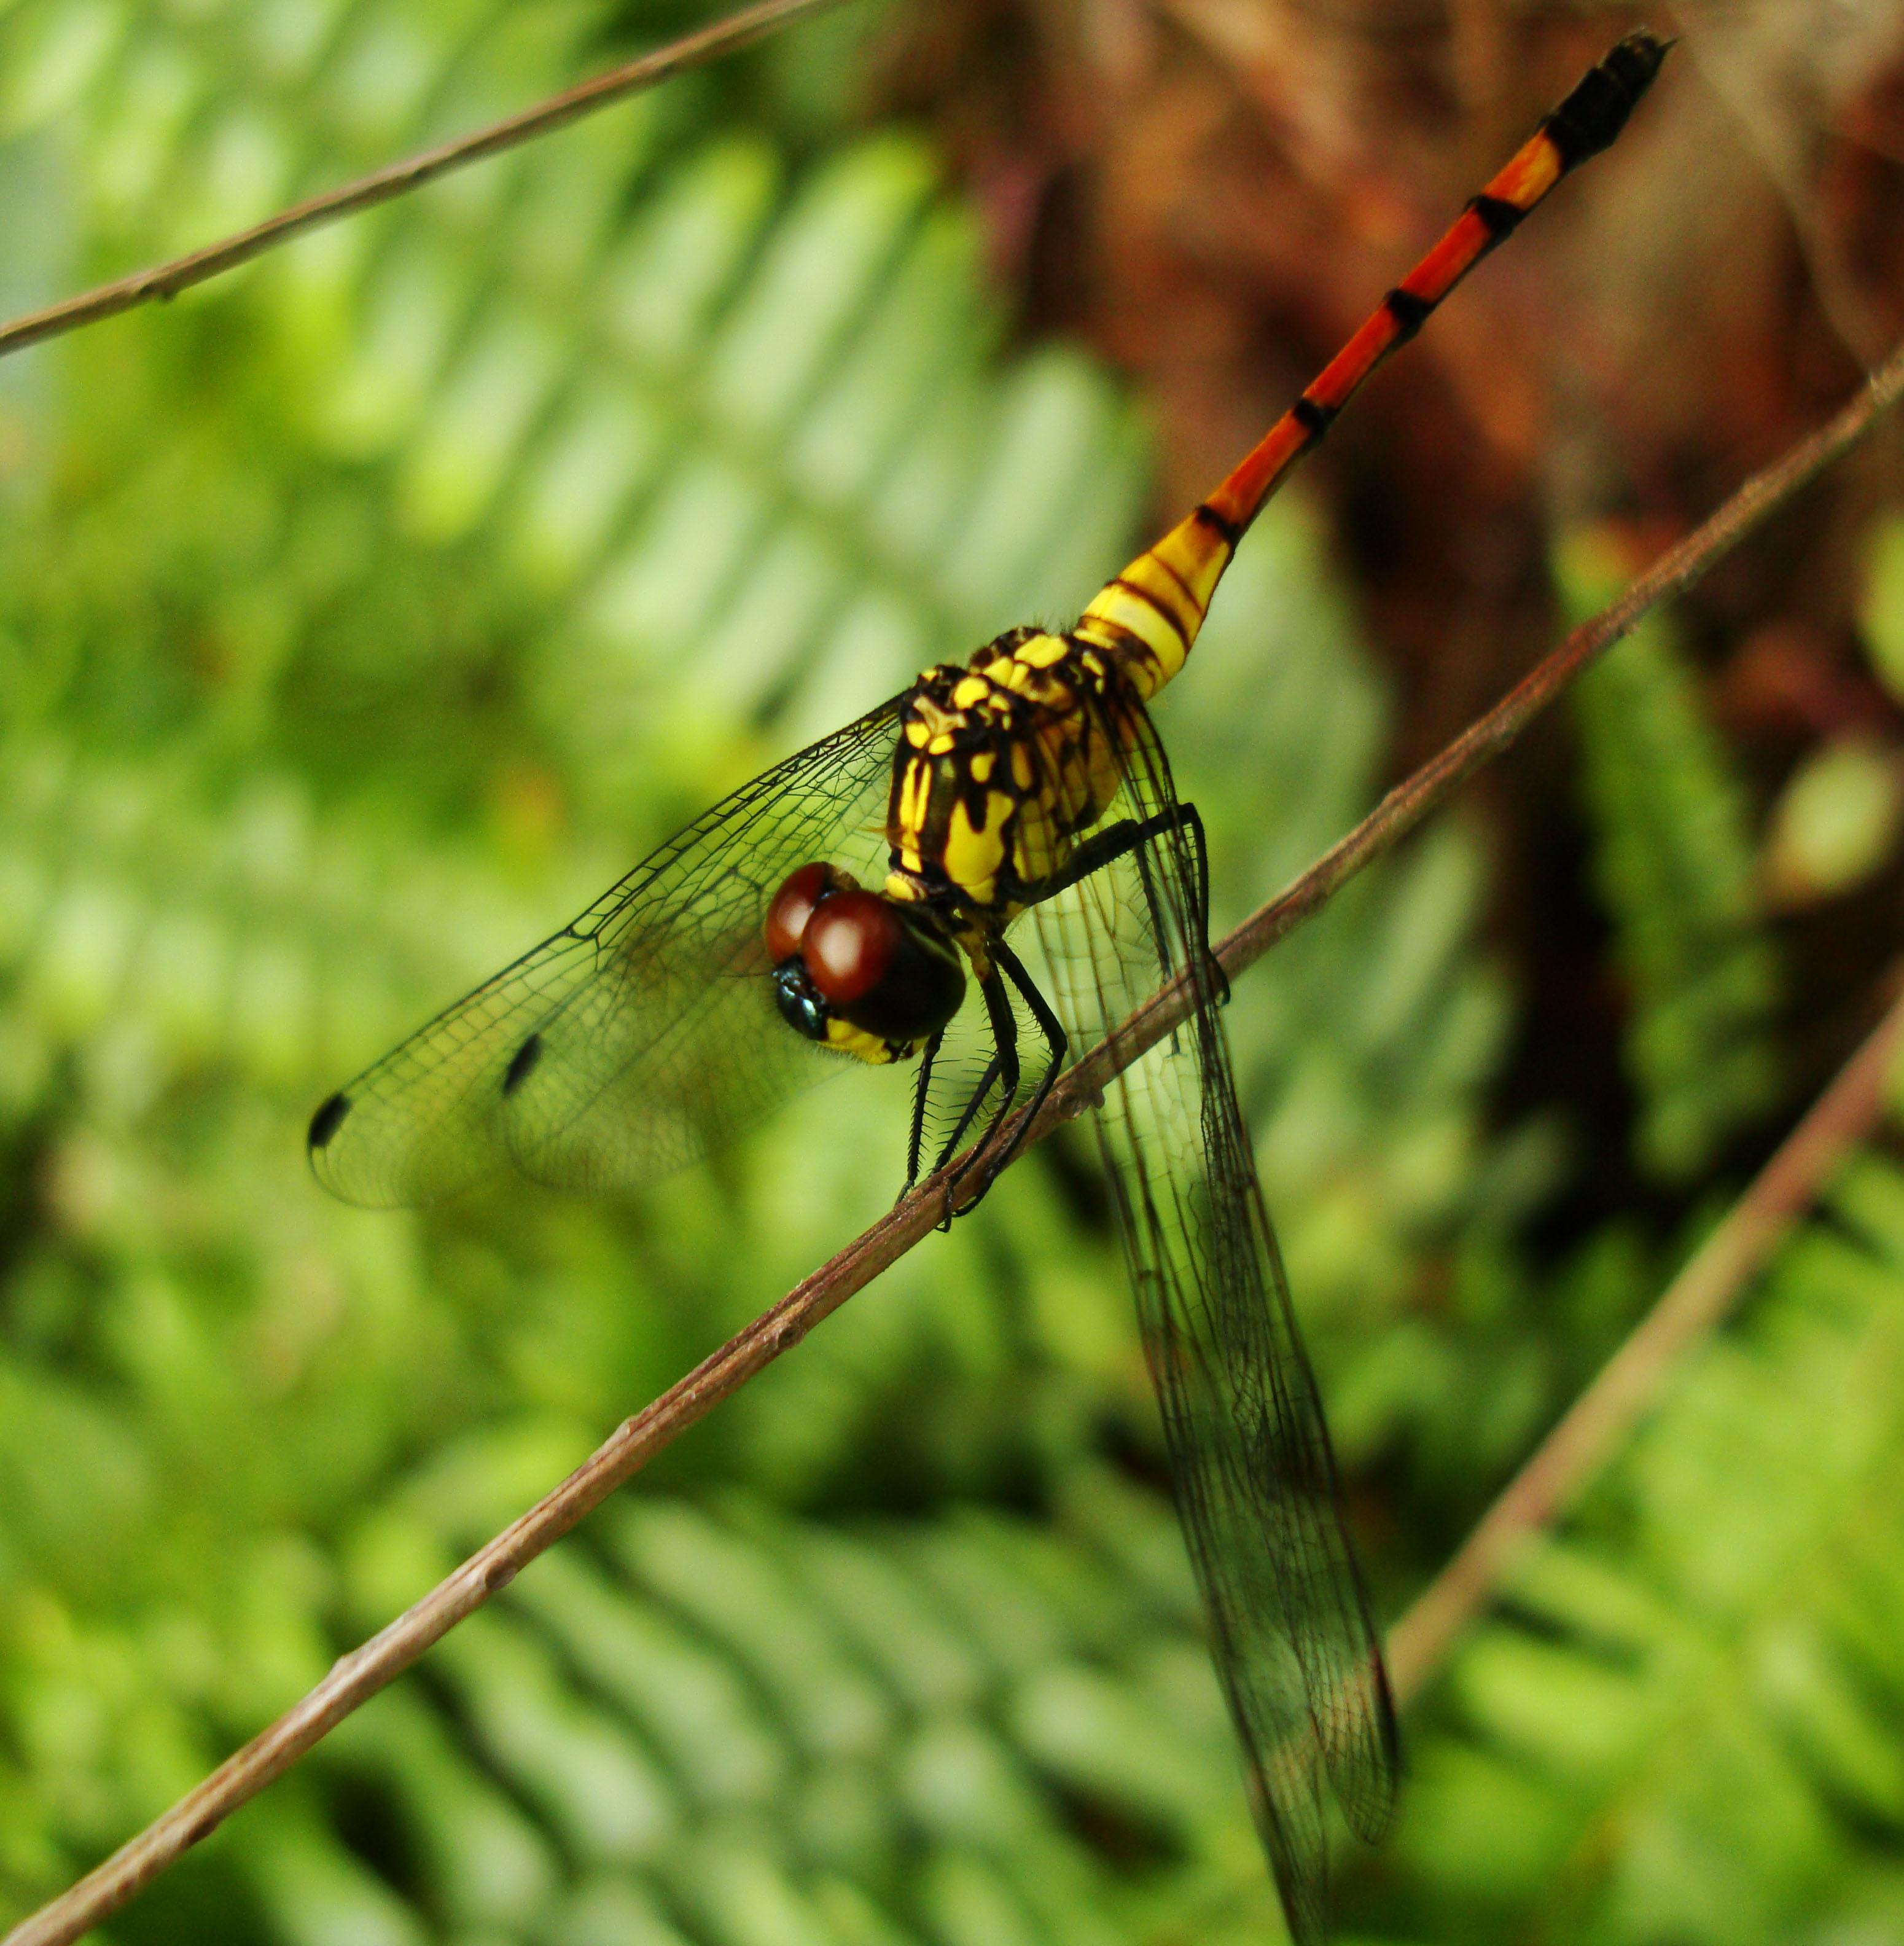 Libellulidae Red Swampdragon Agrionoptera insignis allogenes Sunshine Coast Qld Australia 115